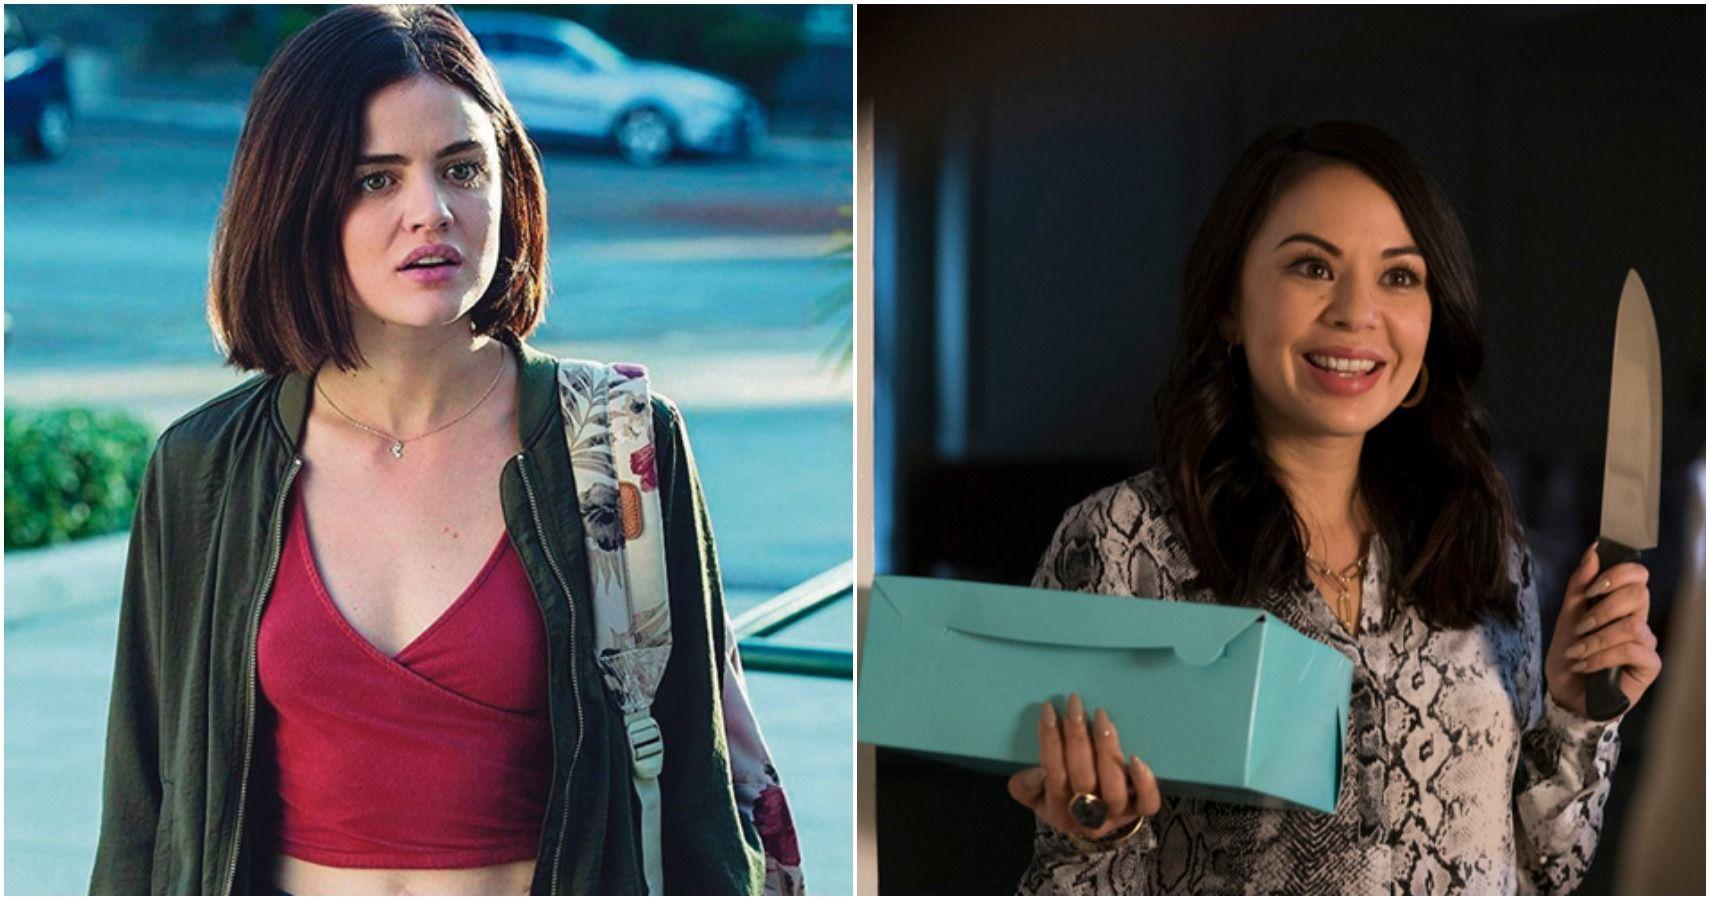 2018 liars cast pretty little 'Pretty Little